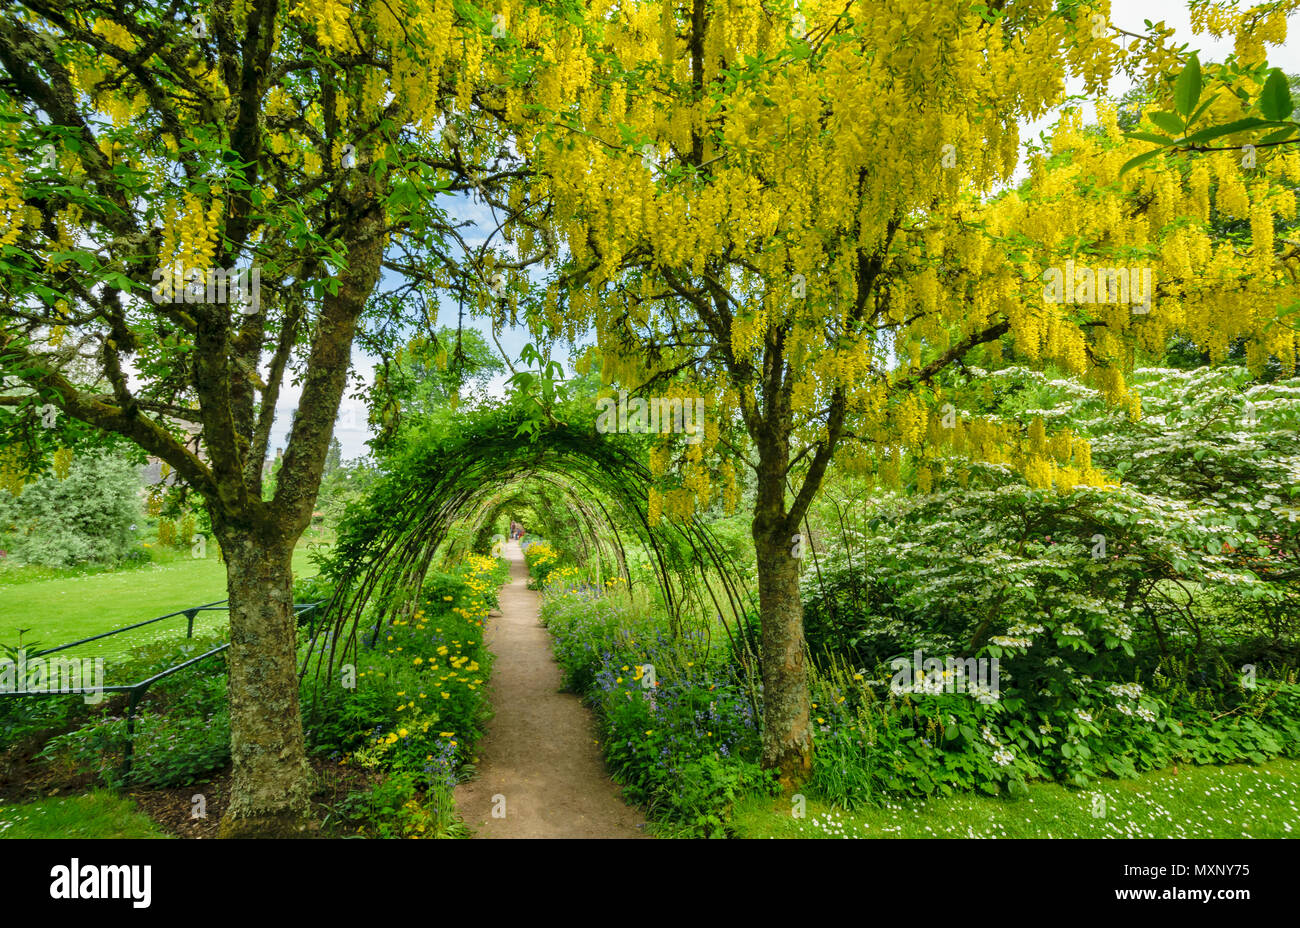 Cawdor castle nairn scotland laburnum trees and yellow flowers with cawdor castle nairn scotland laburnum trees and yellow flowers with archway tunnel lined by flowers mightylinksfo